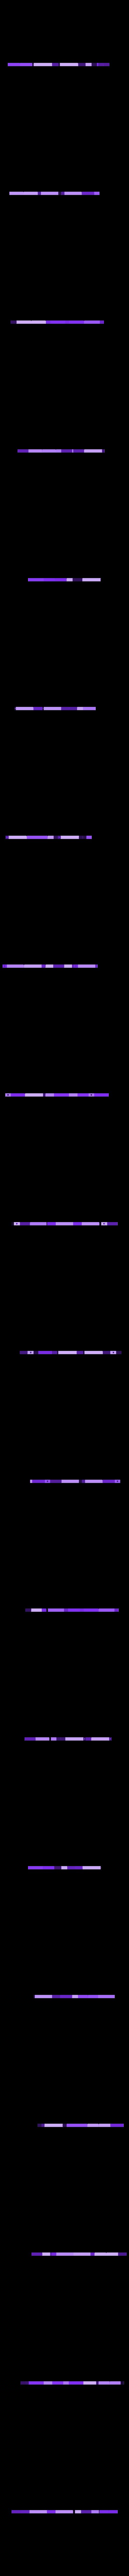 Polygon_Necklace_Bevel.stl Download free STL file Graphic Necklace - Polygon • 3D printing object, Khuzural